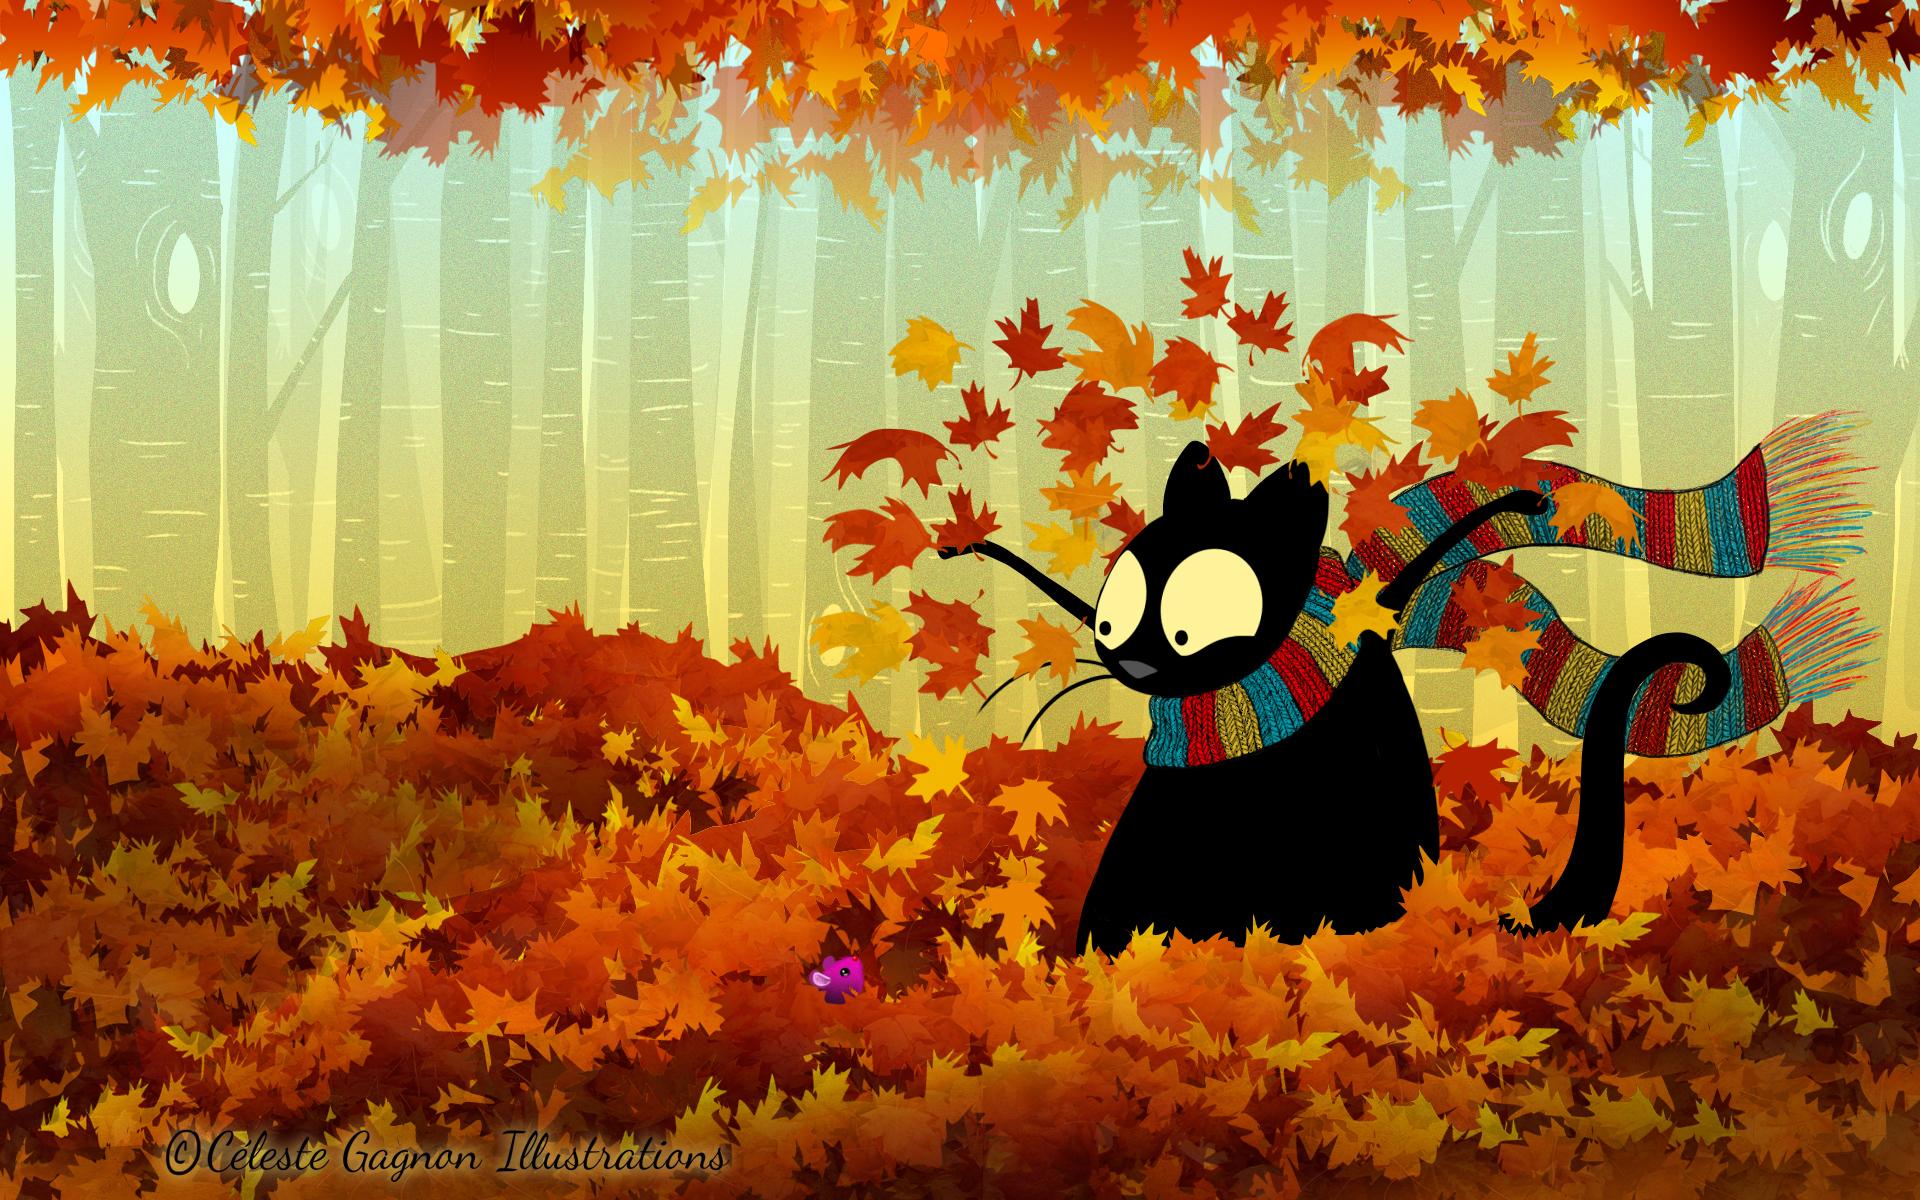 Картинки на рабочий стол приколы осень, аниме картинки картинки